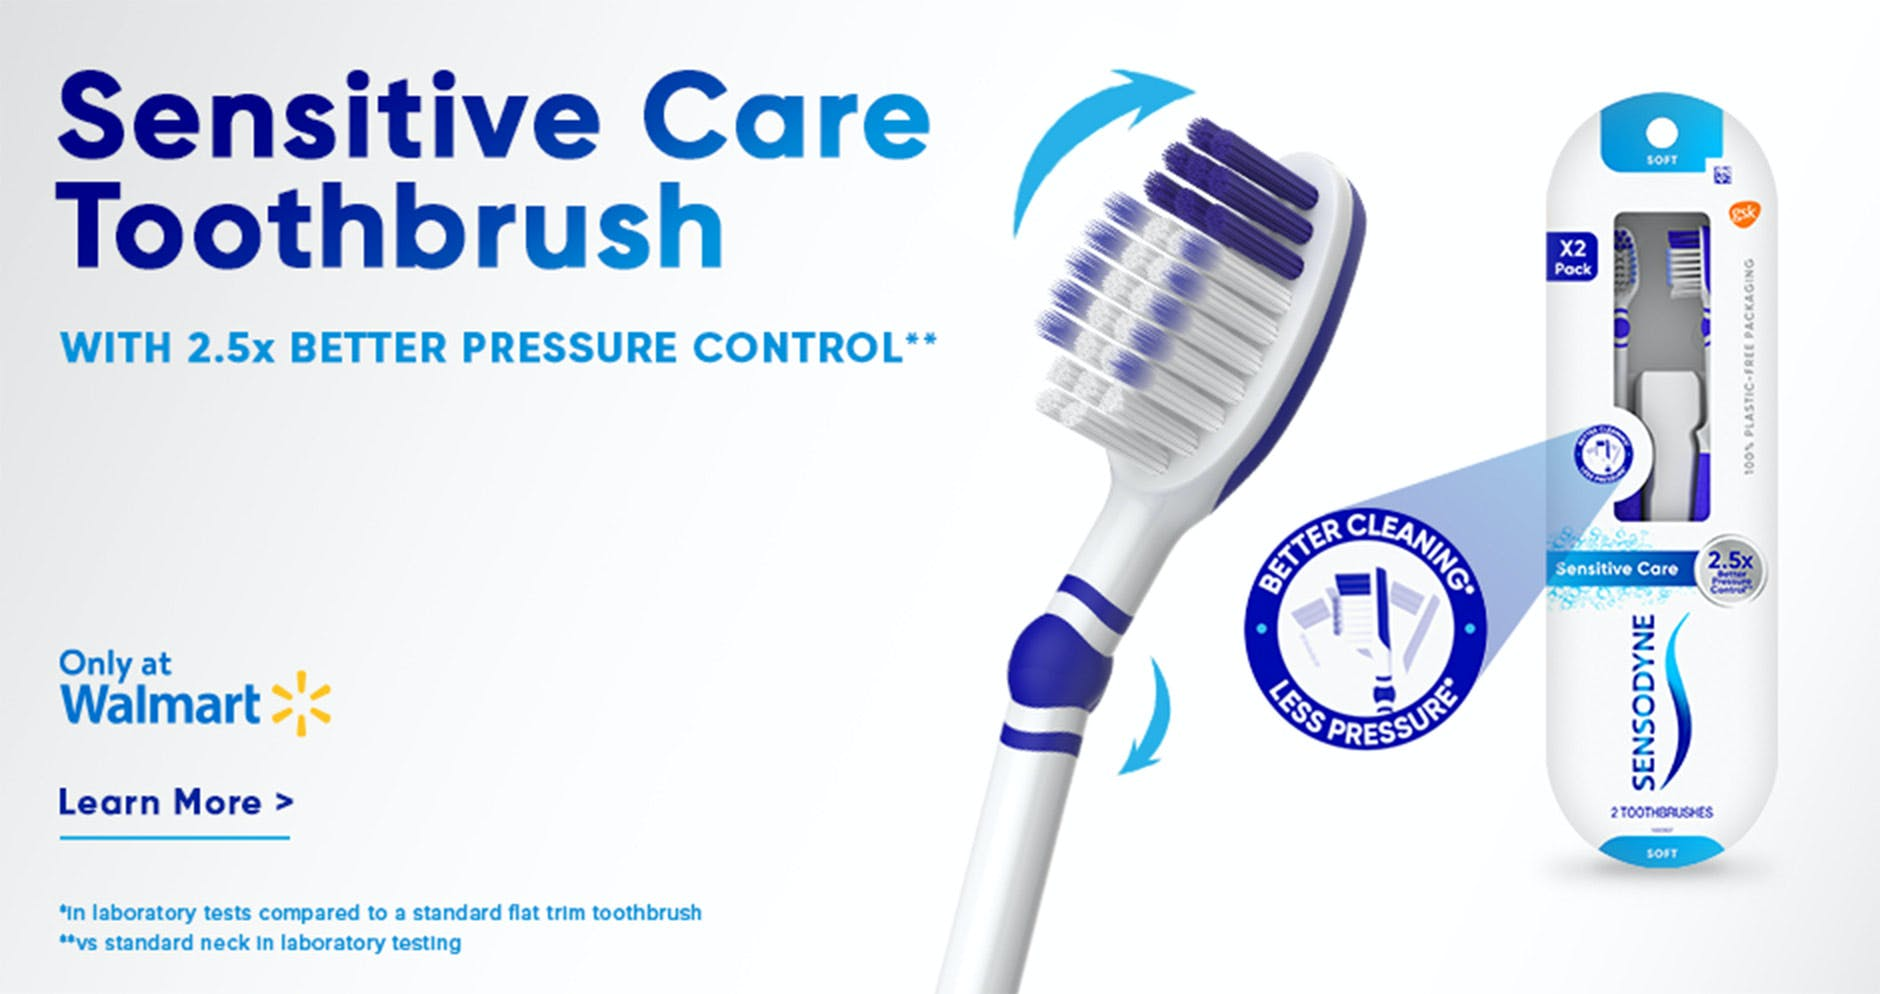 Sensodyne Sensitive Care Toothbrush close-up shot and packaging